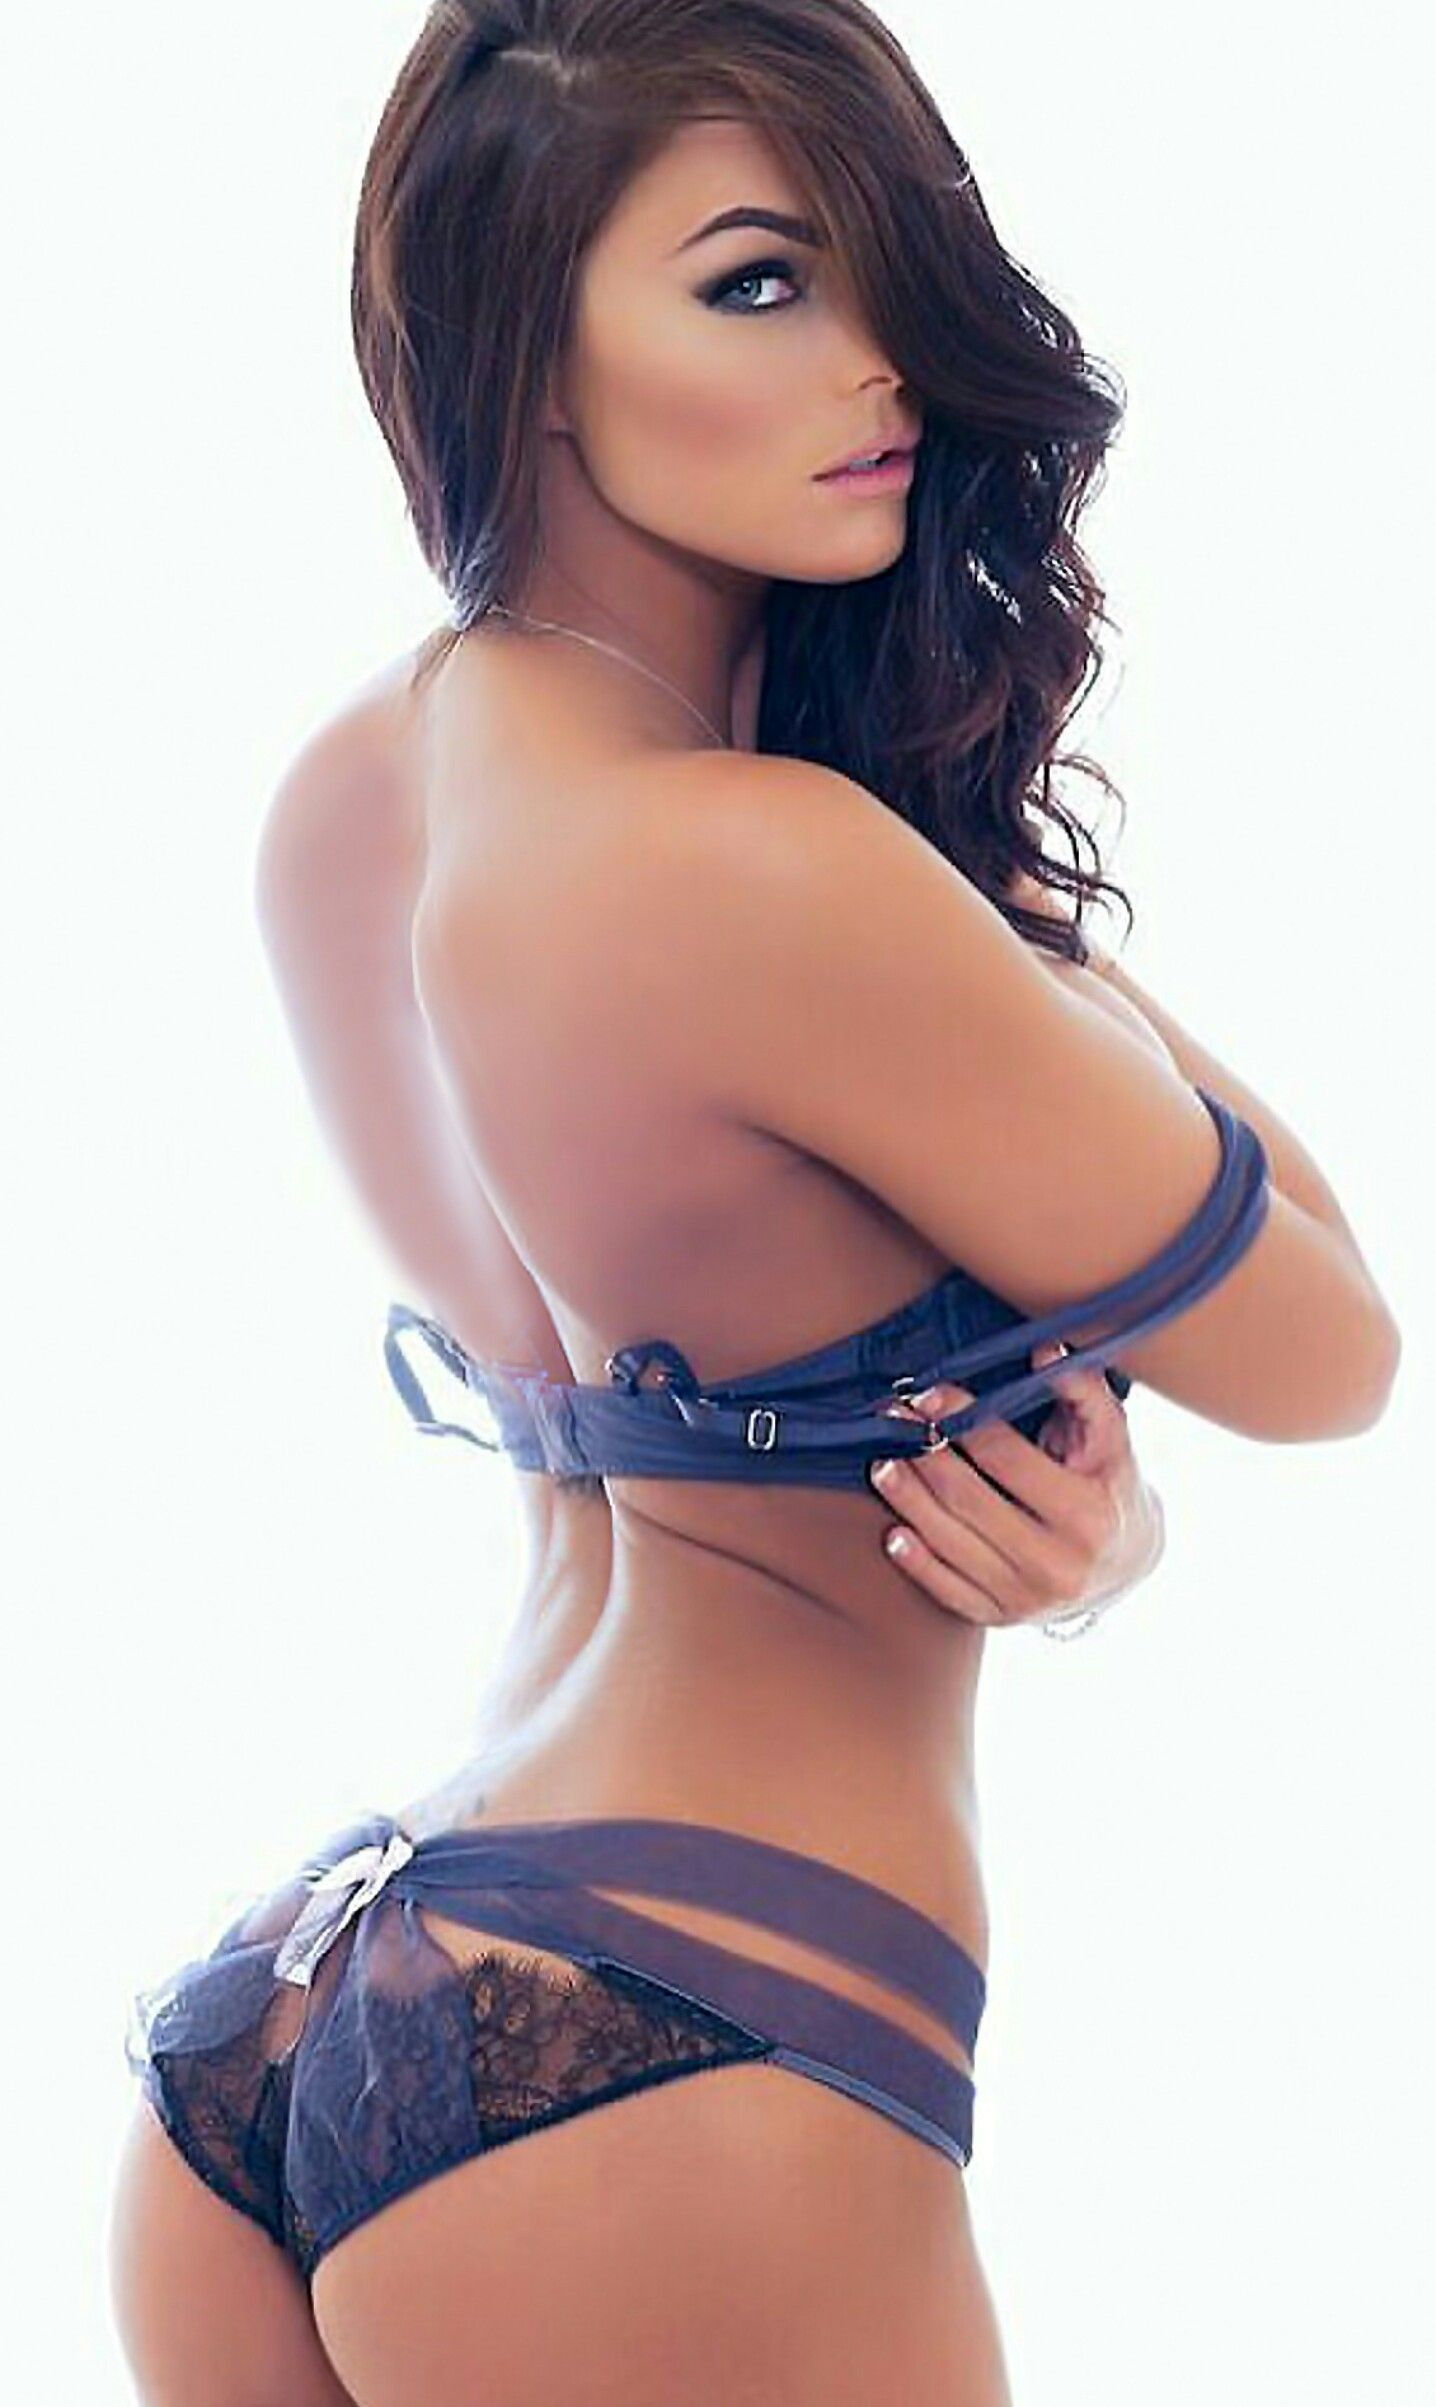 hot curvy women